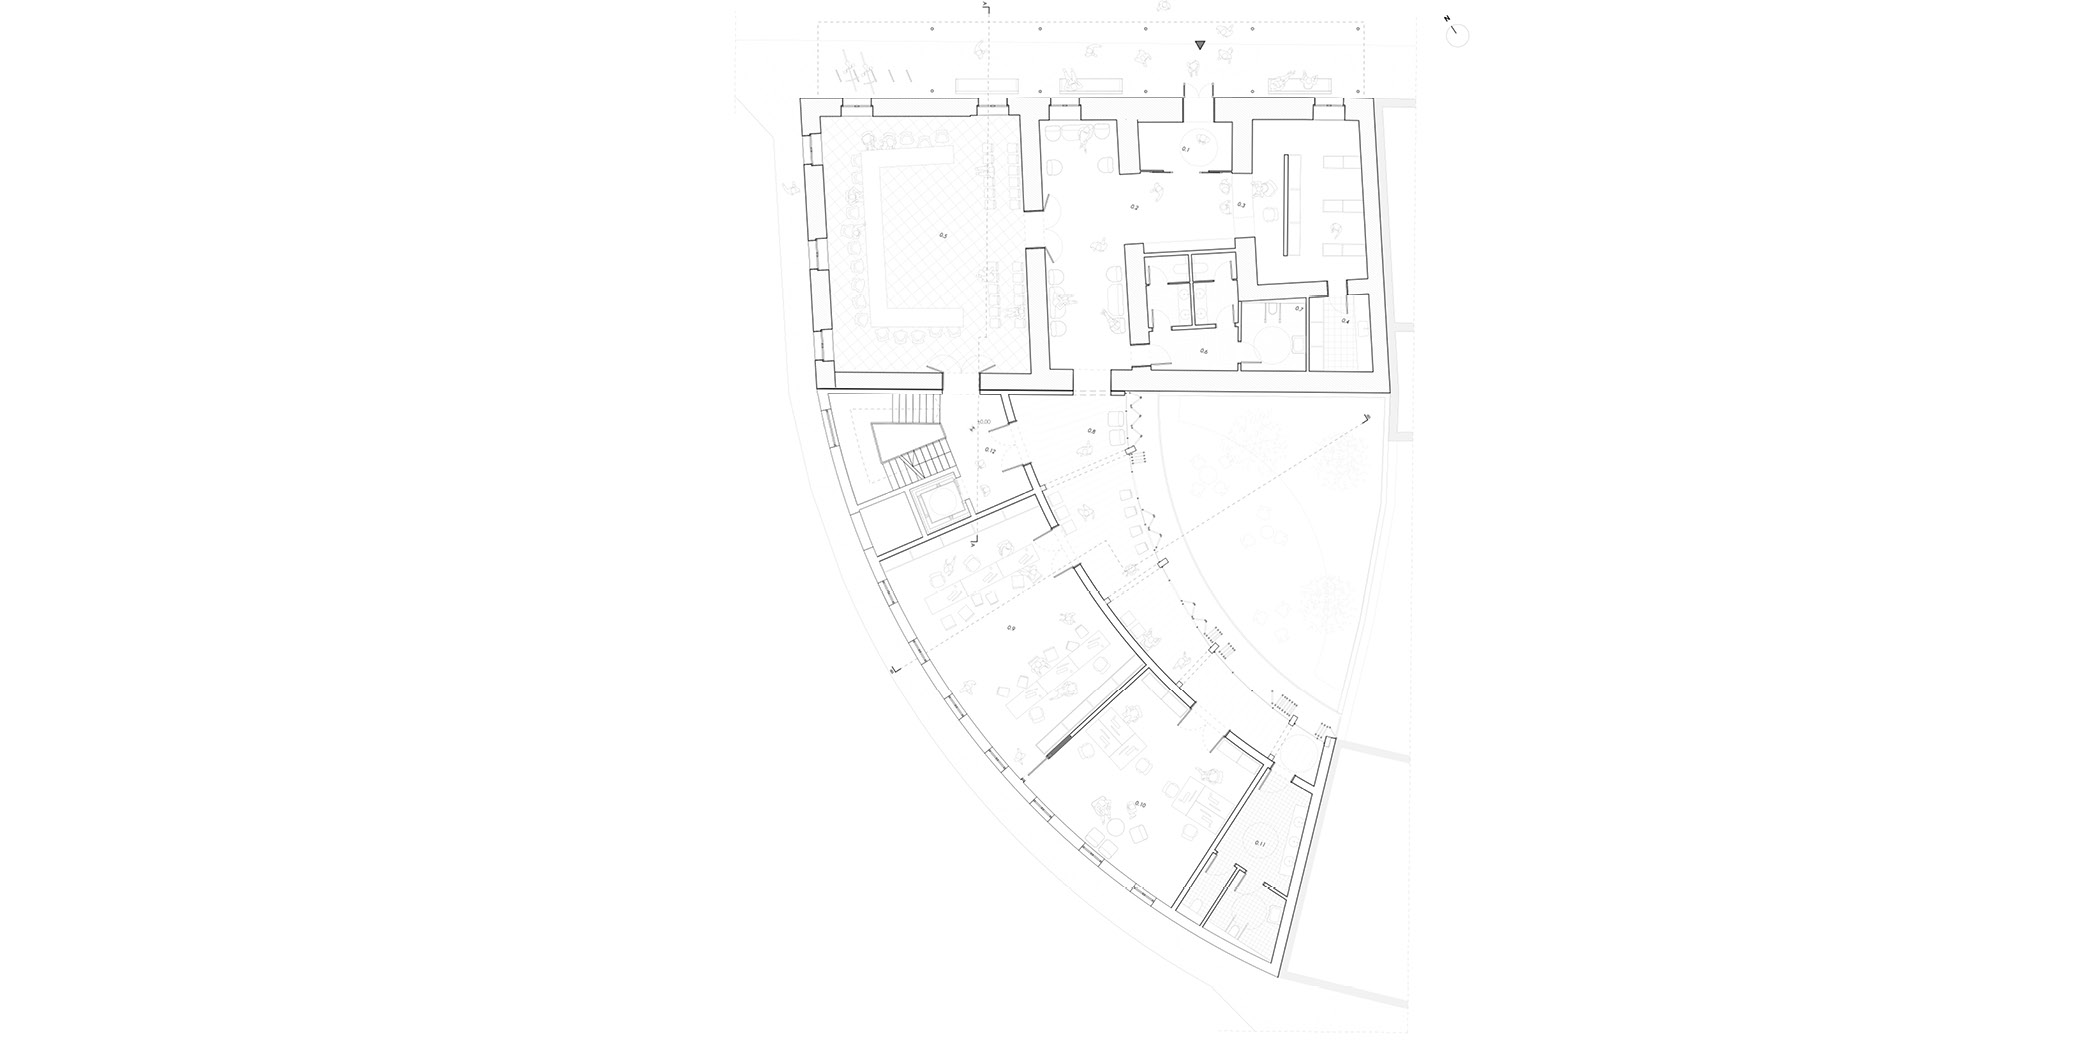 Daganzo City Hall Extention Architecture Arquitectura OCA ARCHITECTS OCA arquitectas Hernan Lleida Bernardo Garcia_7